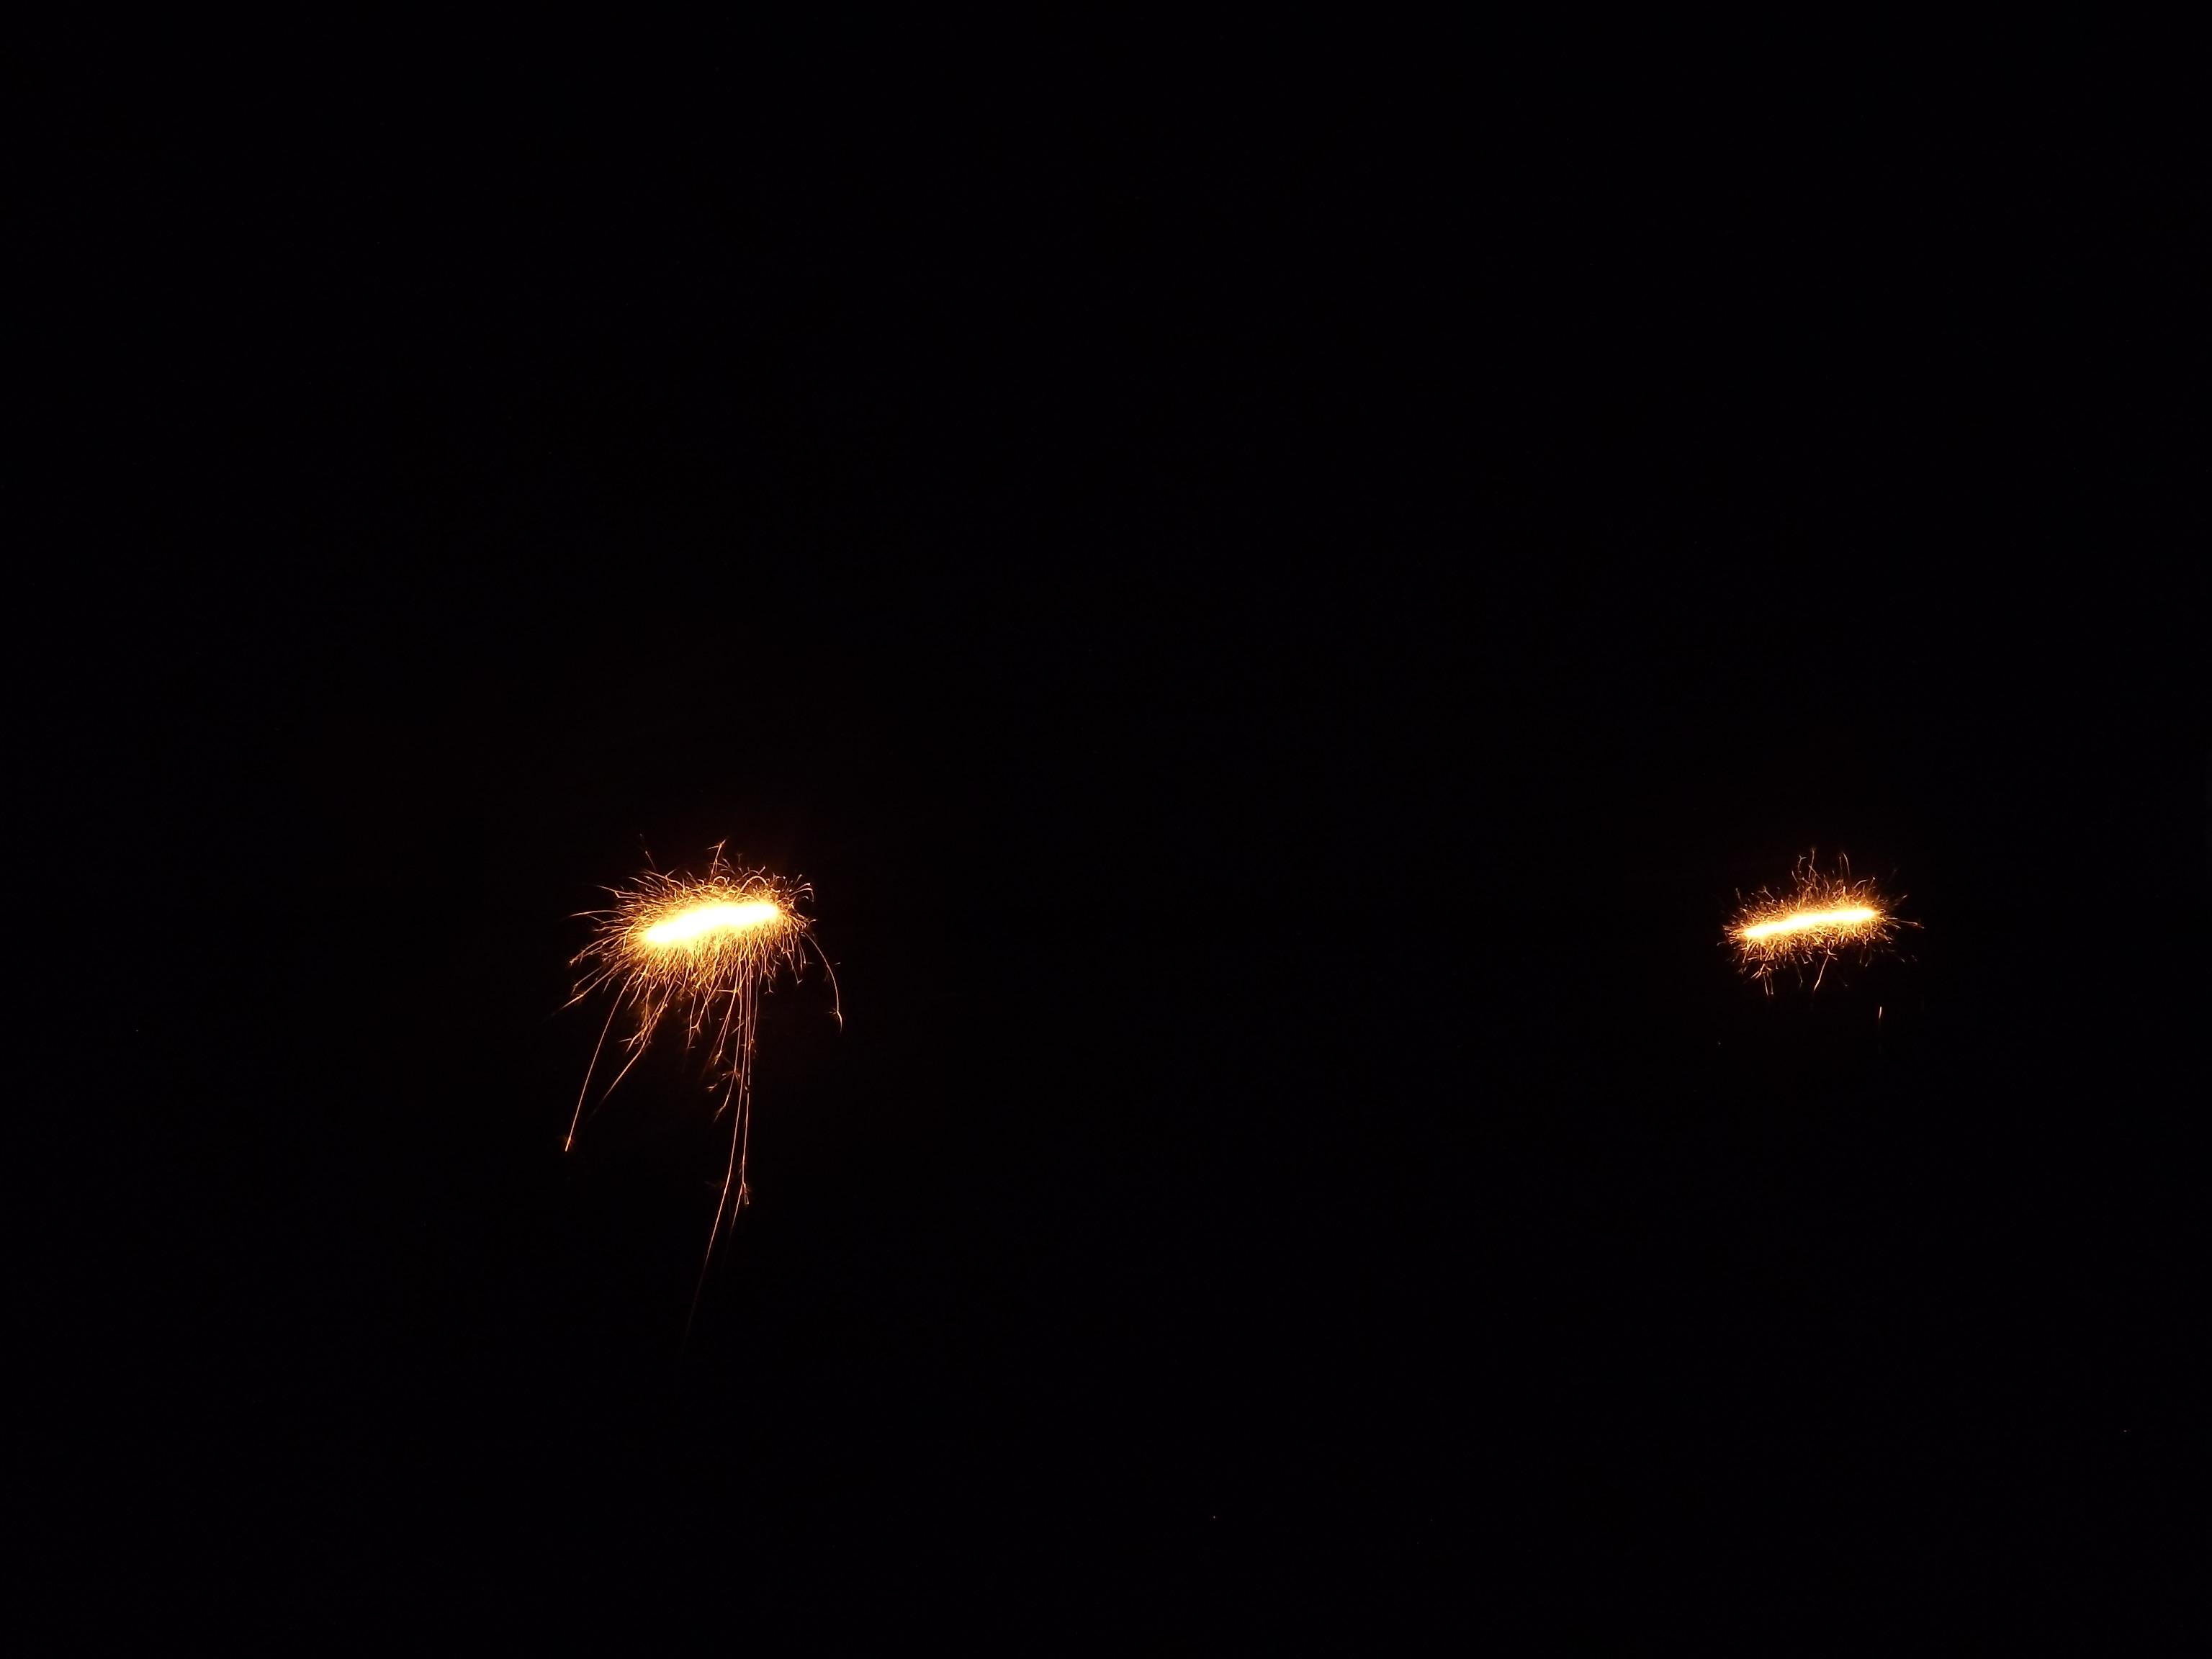 8348-funken-feuer-schmelzen